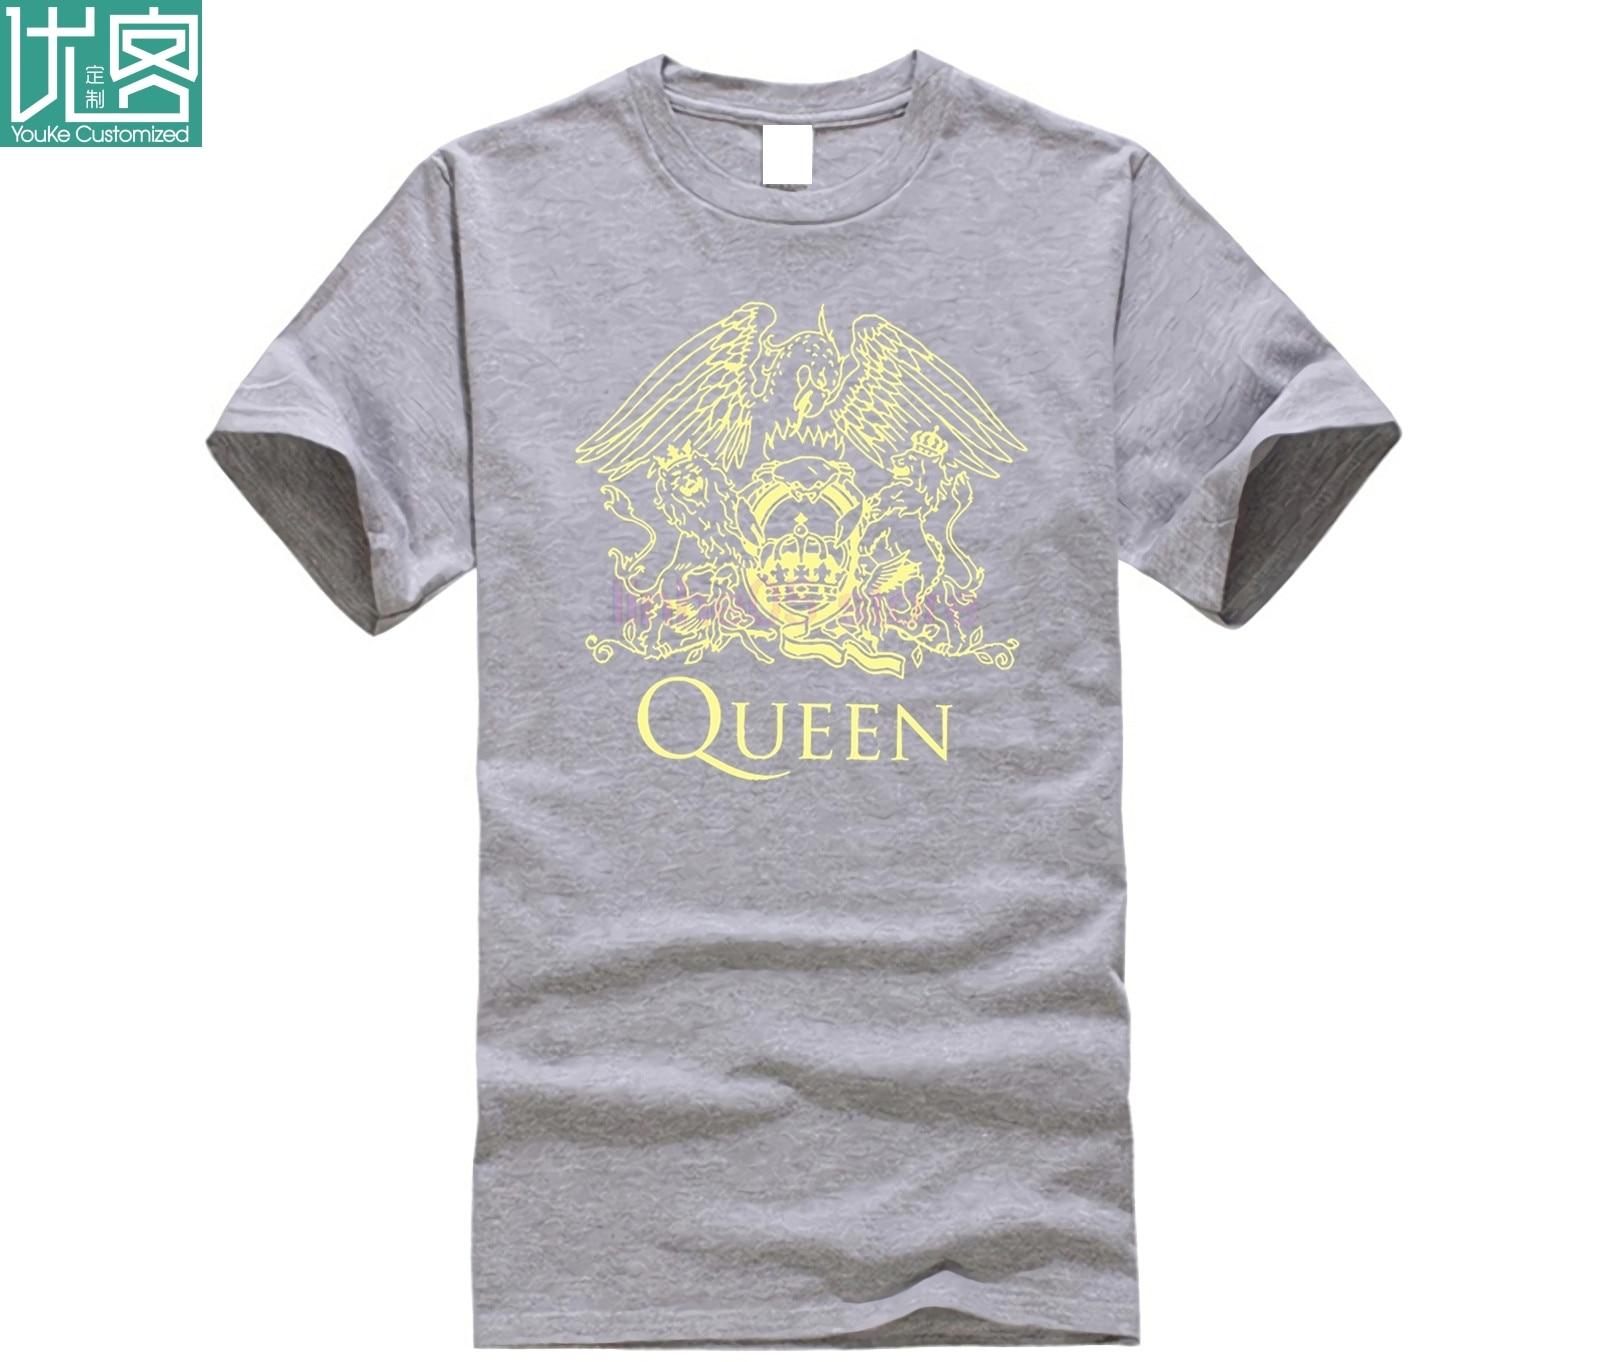 Men 39 s T shirts Summer Style Fashion Swag Men T Shirts Queen Band Rock Music Logo Men 39 s T shirt in T Shirts from Men 39 s Clothing